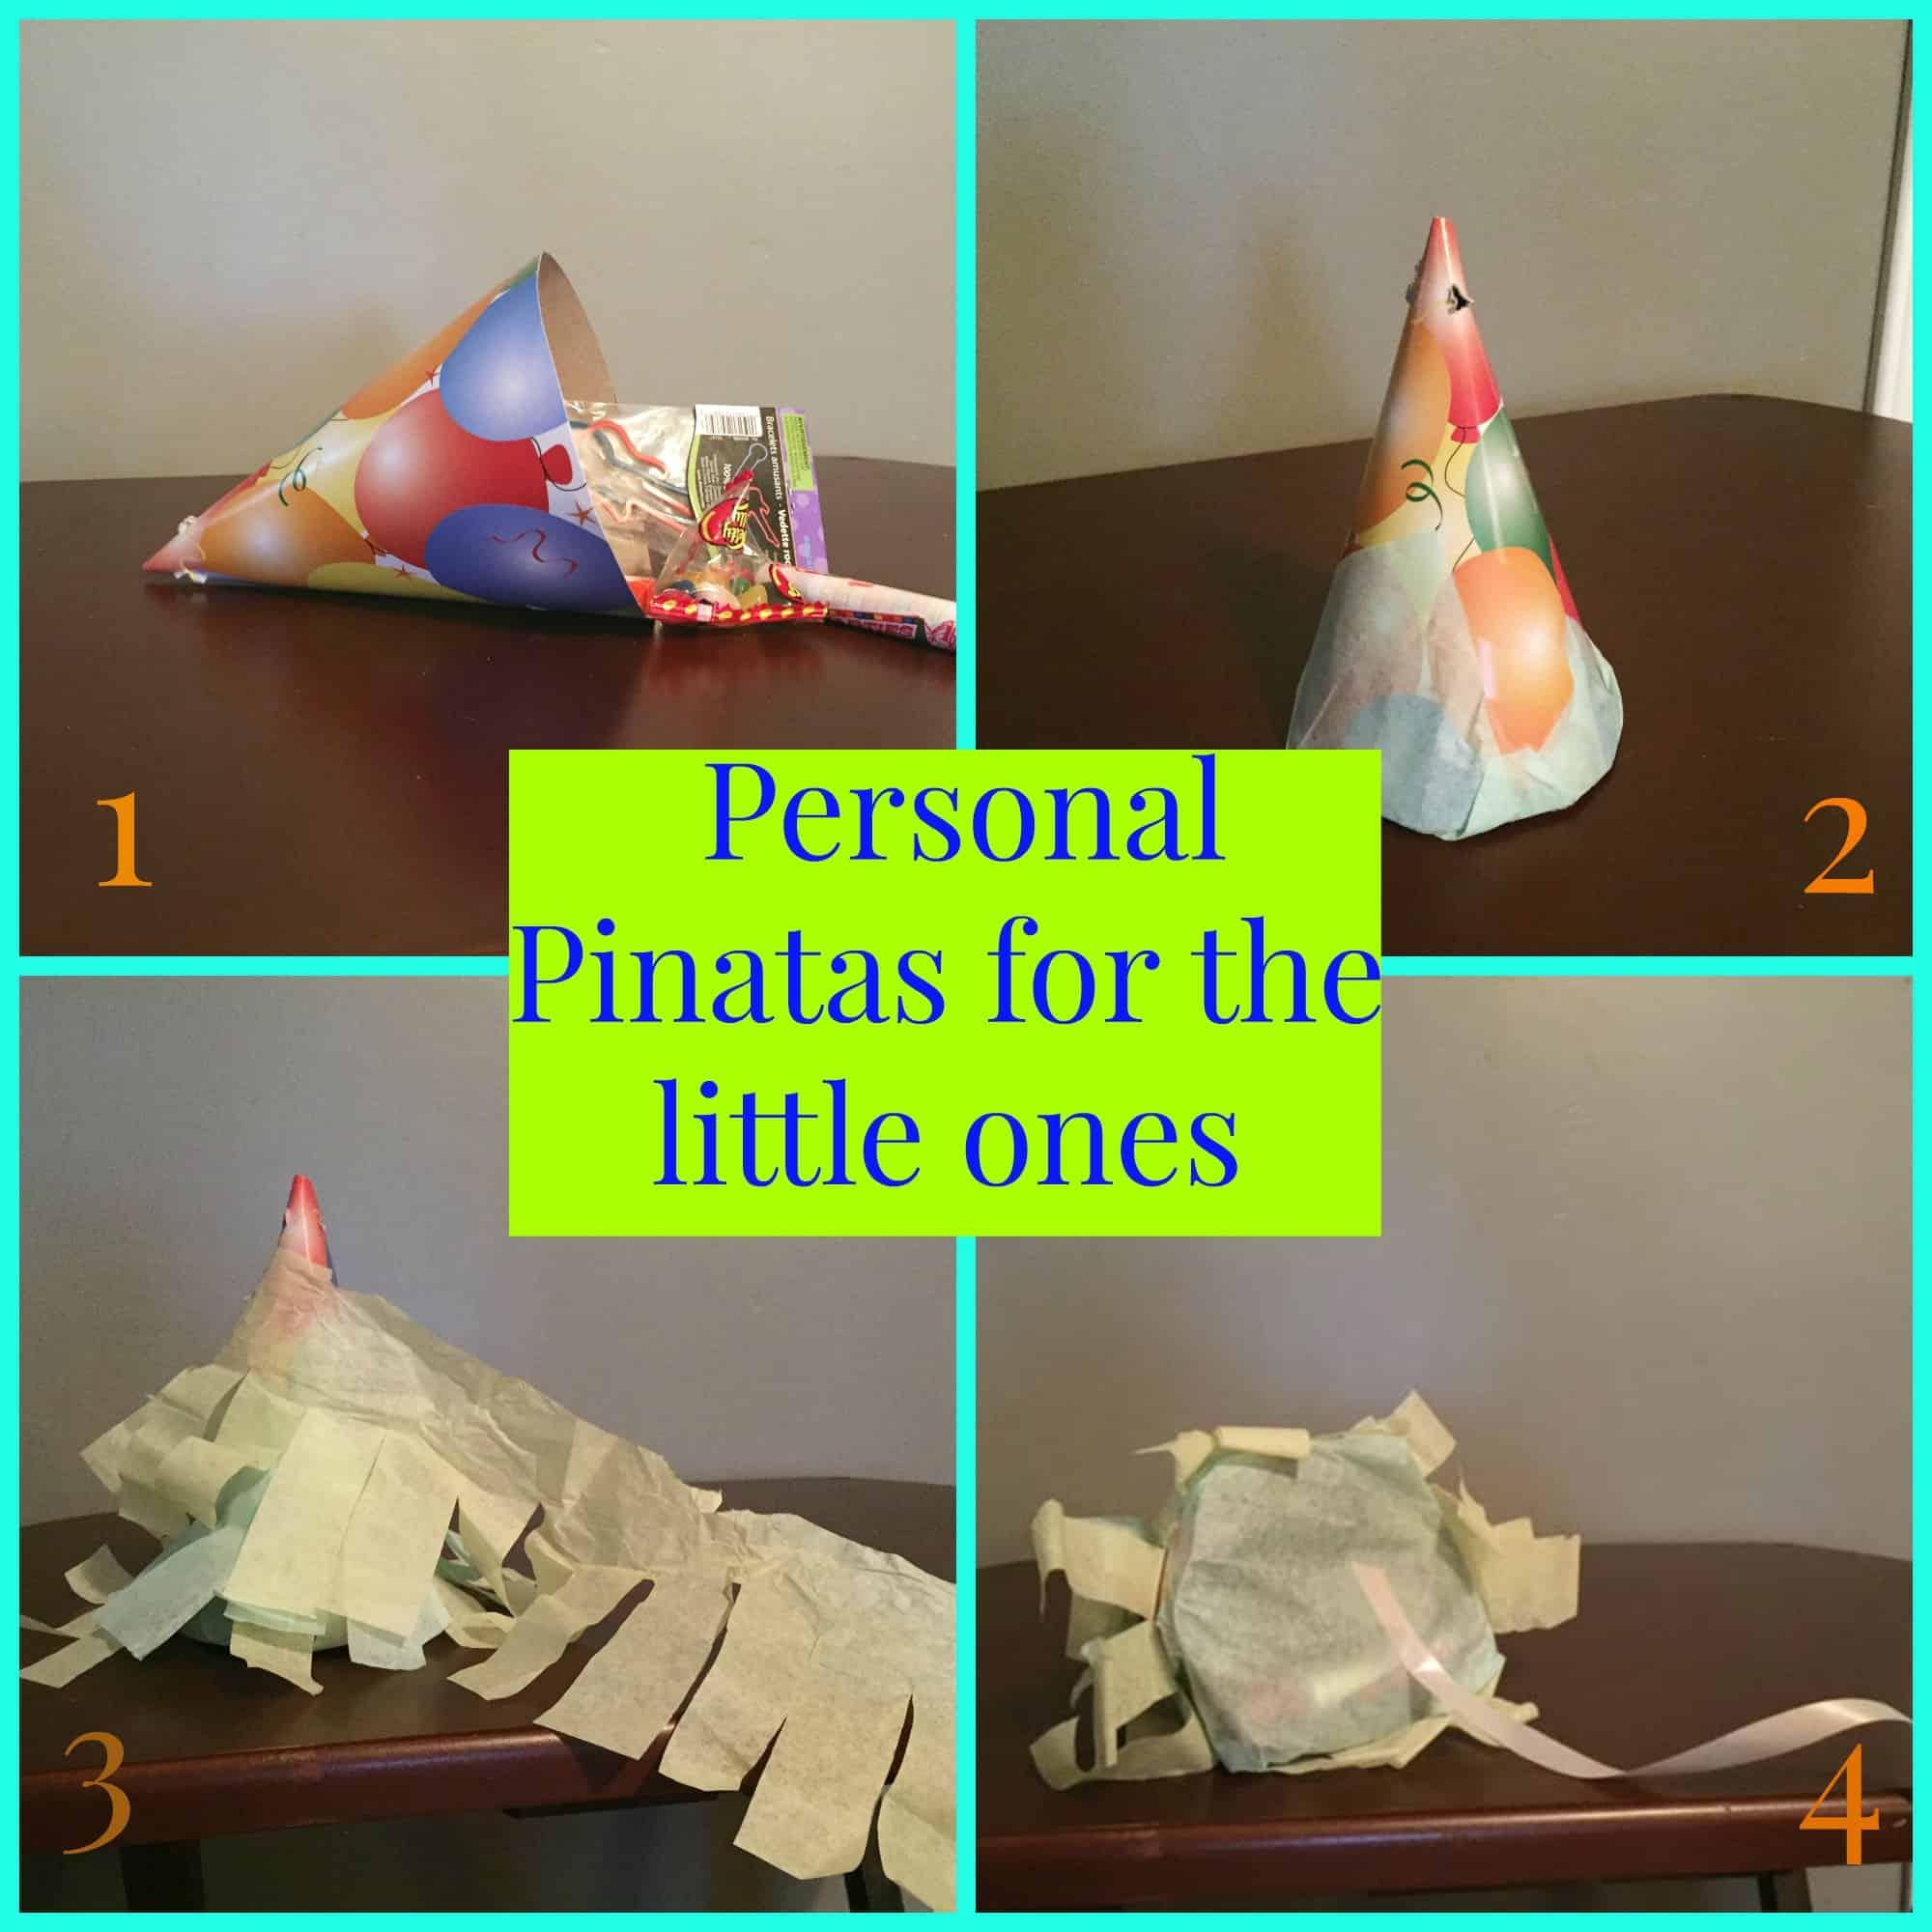 Personal pinatas made from birthday hats